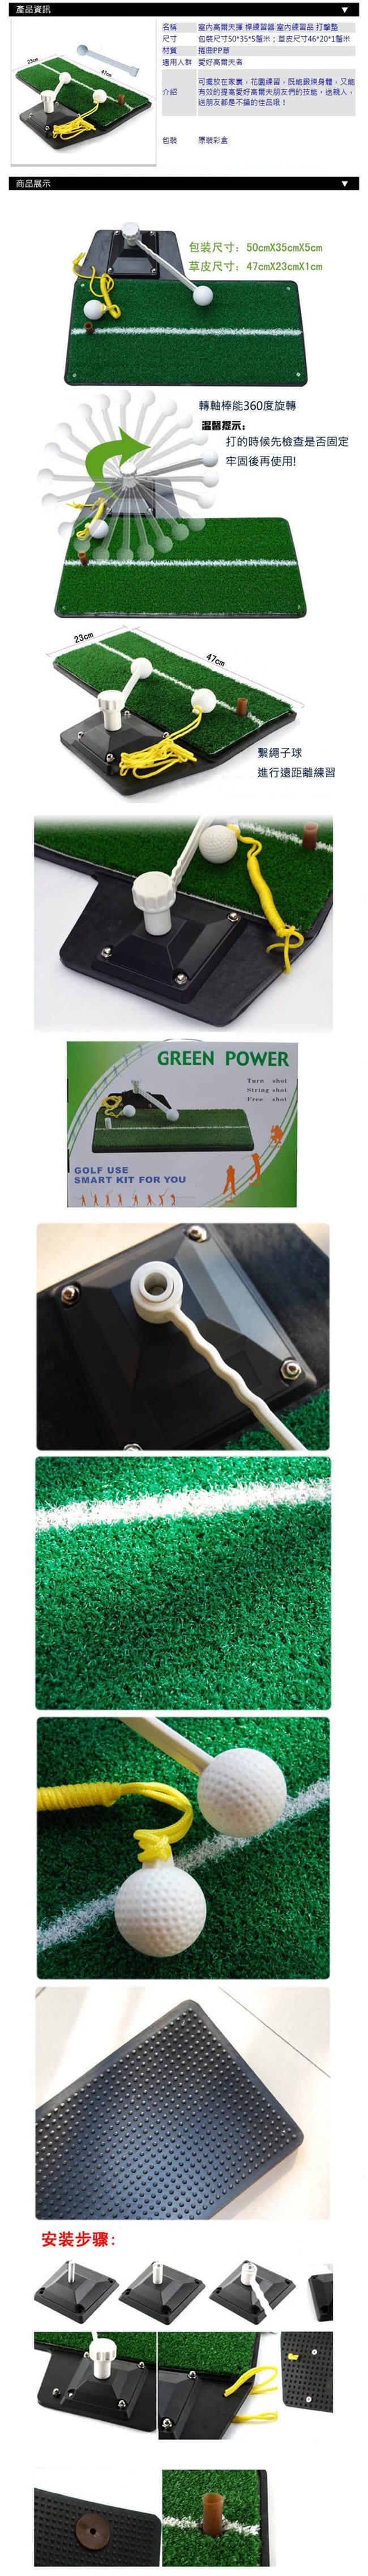 【LOTUS】高爾夫 3合1揮桿練習器 打擊墊 1